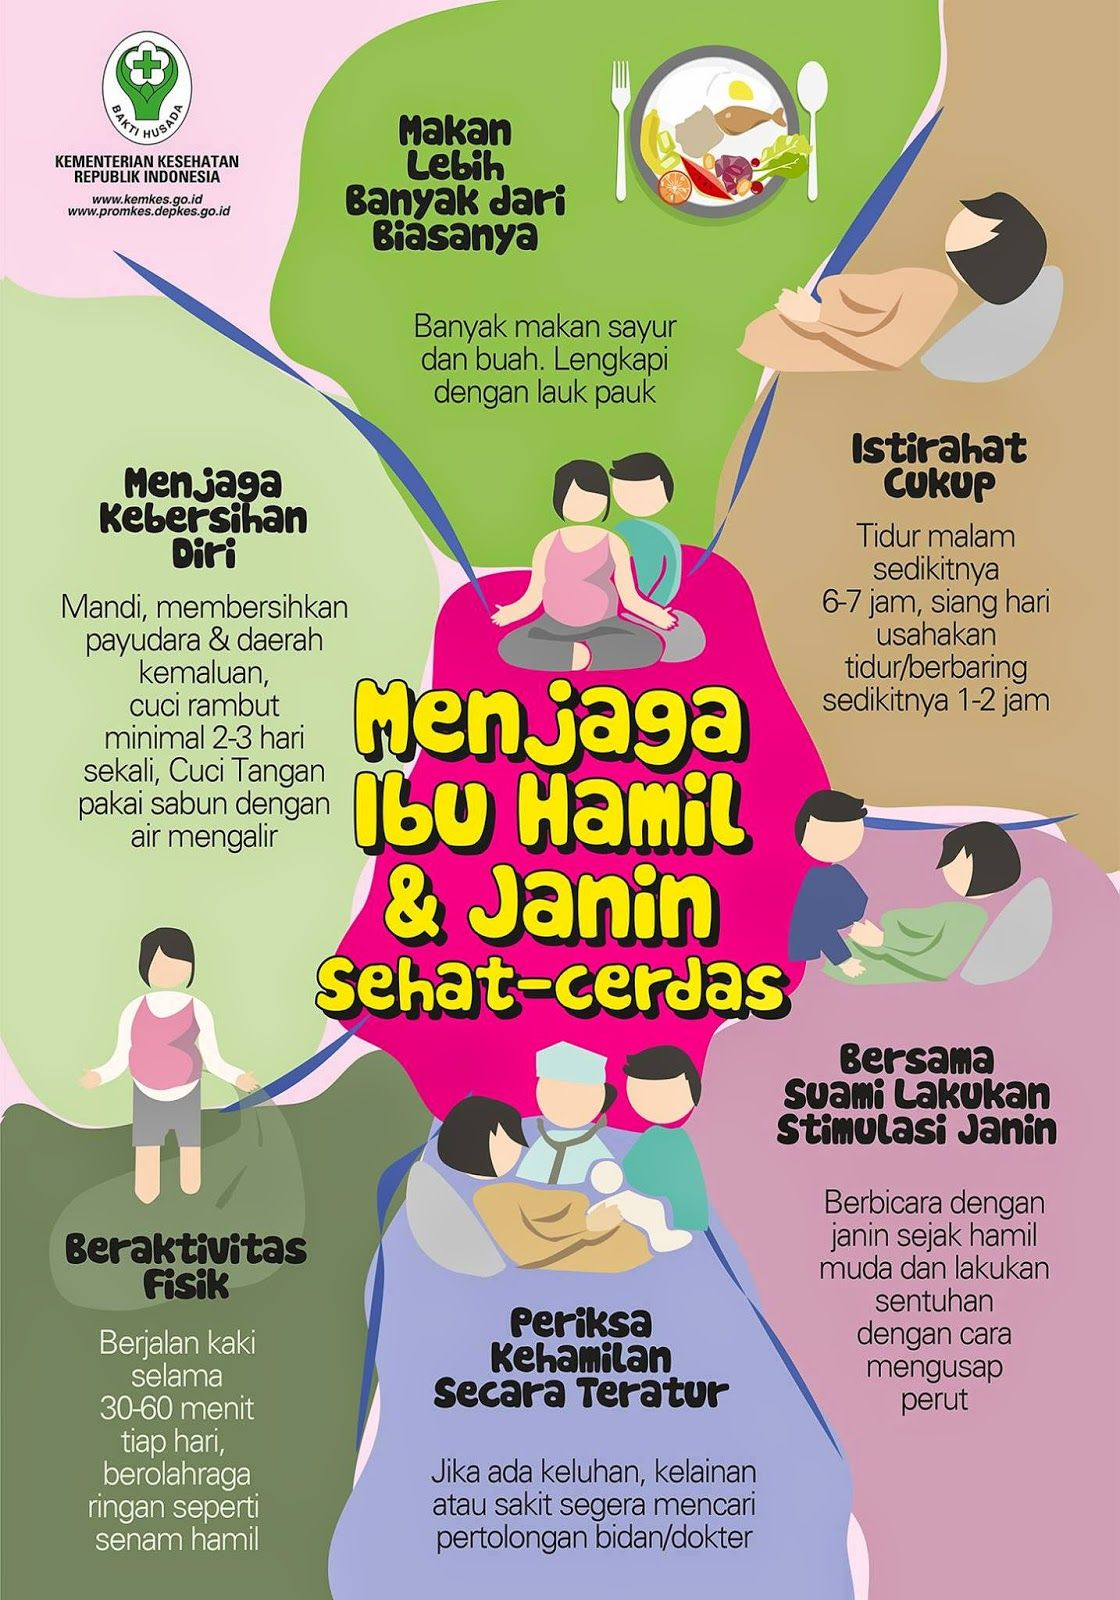 Menjaga Ibu Hamil Dan Janin Tetap Sehat Infografis Kesehatan Kehamilan Sehat Kehamilan Kesehatan Bayi